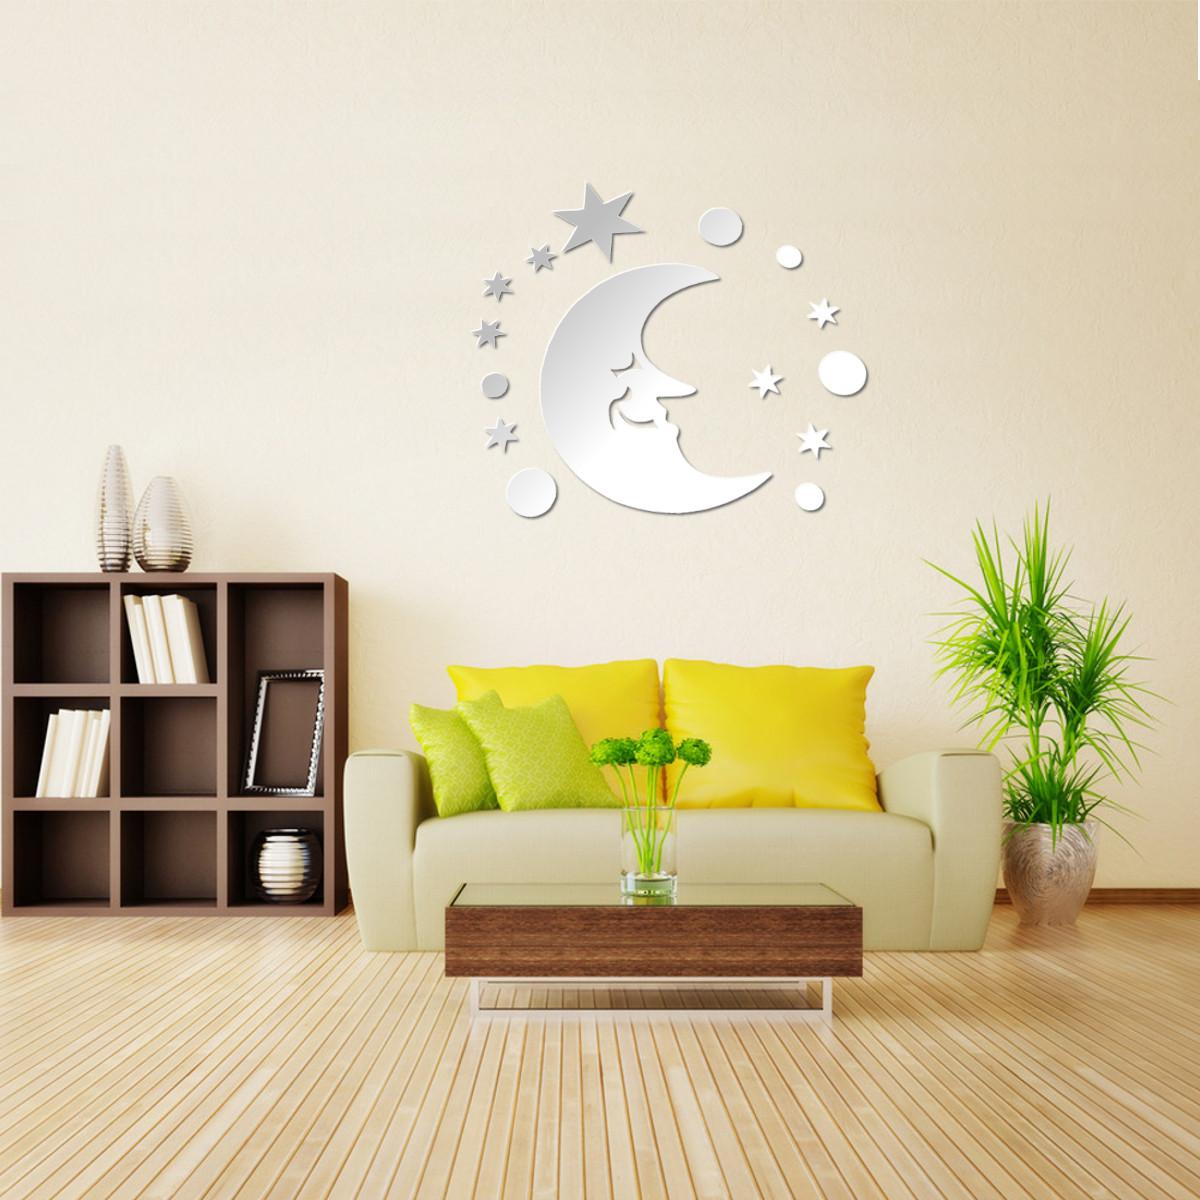 Modern 3D Mirror Acrylic Home Room Office DIY Decor Art Wall Sticker ...